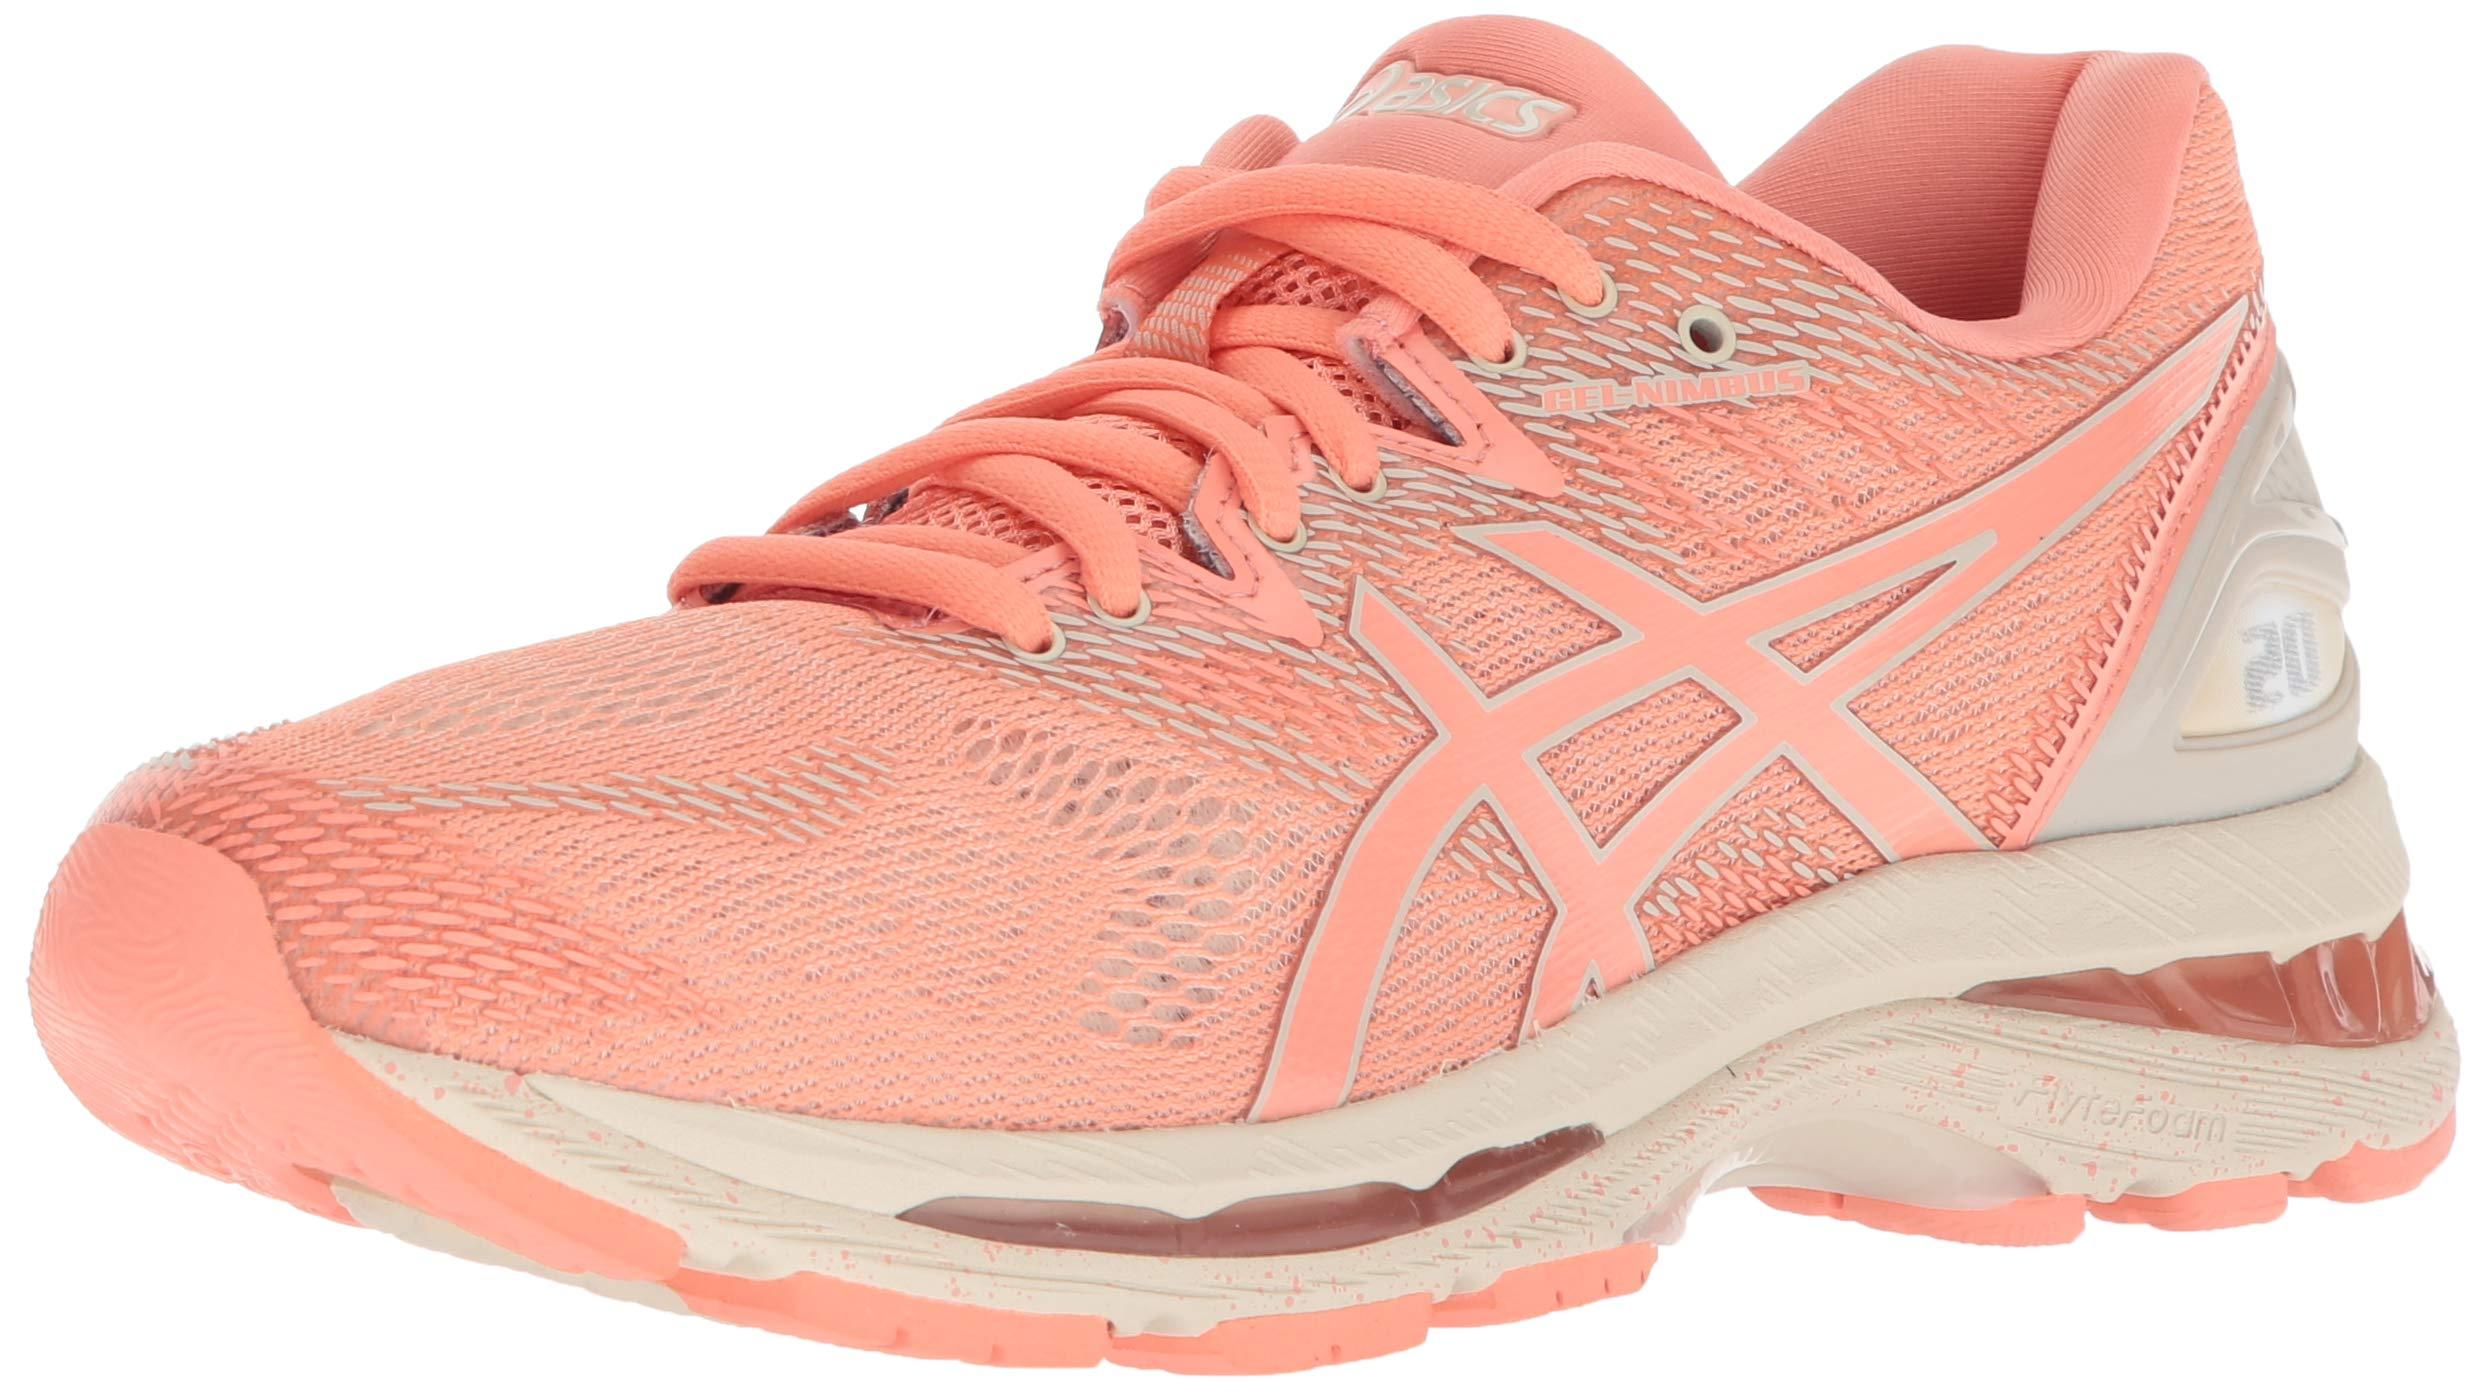 ASICS Women's Gel-Nimbus 20 Running Shoe, cherry/coffee/blossom, 10 Medium US by ASICS